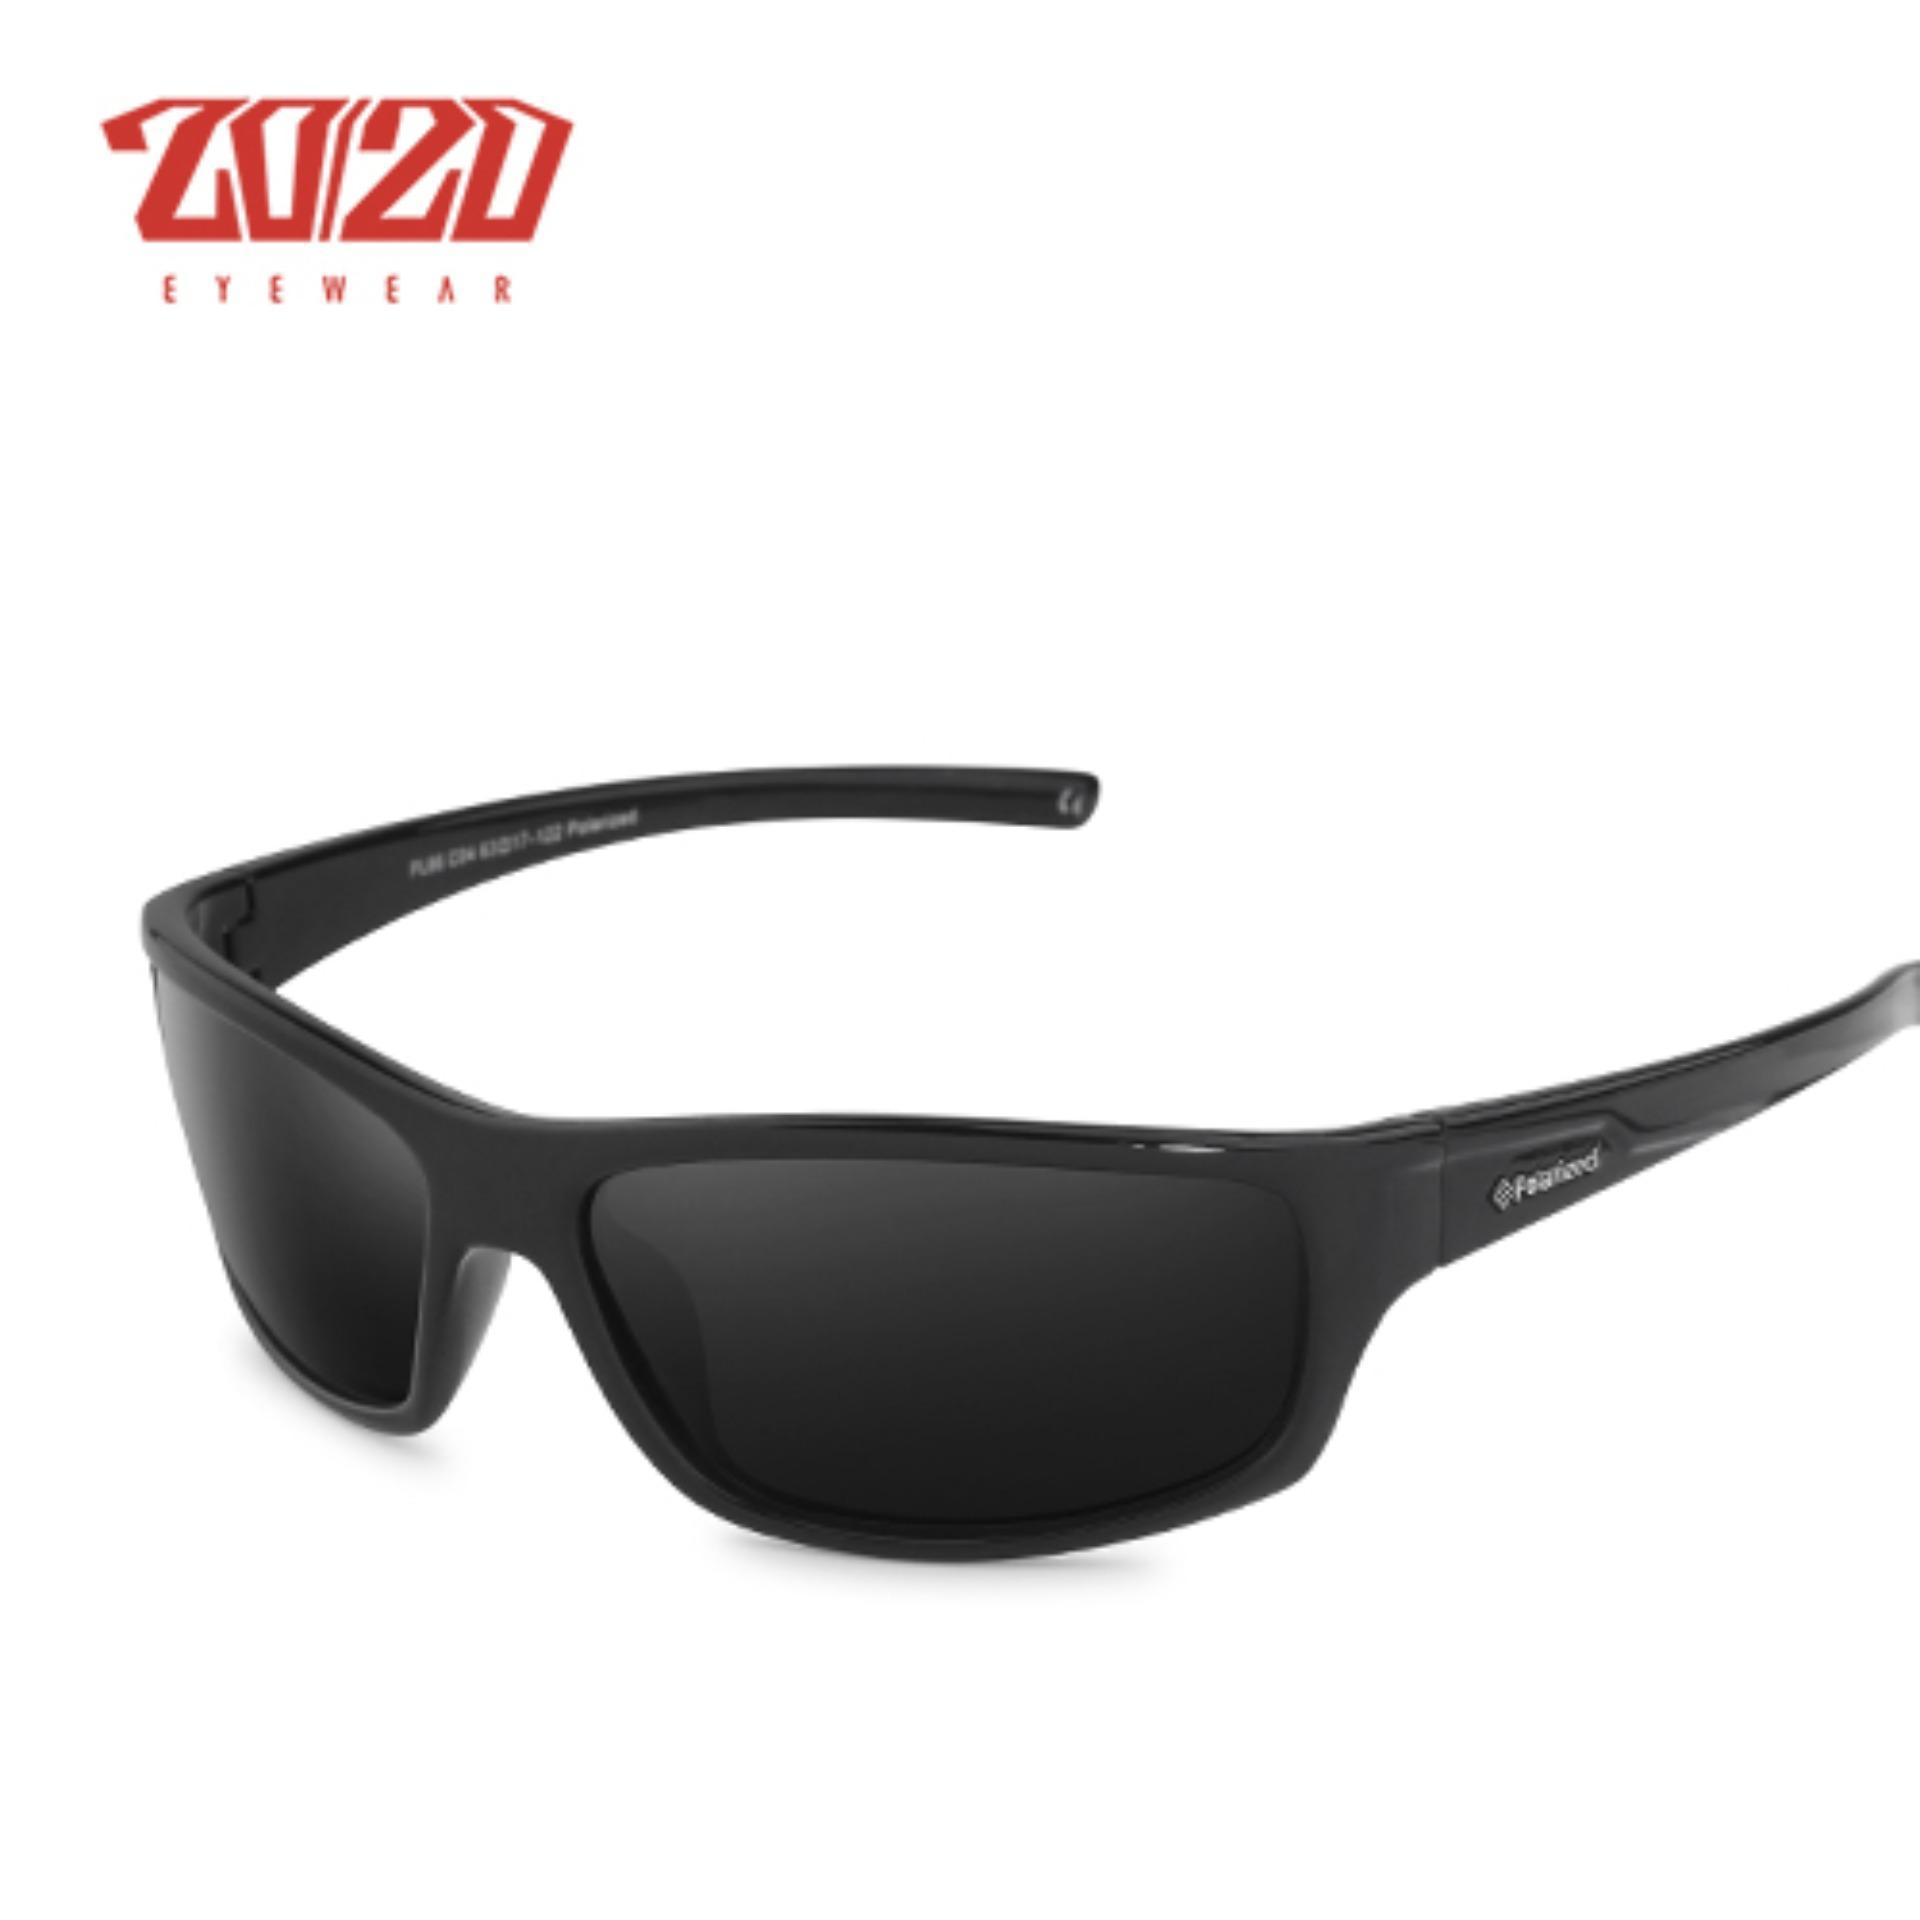 55e1388731 20 20 Optical New Polarized Sunglasses Men Fashion Male Eyewear Sun Glasses  Travel Oculos Gafas